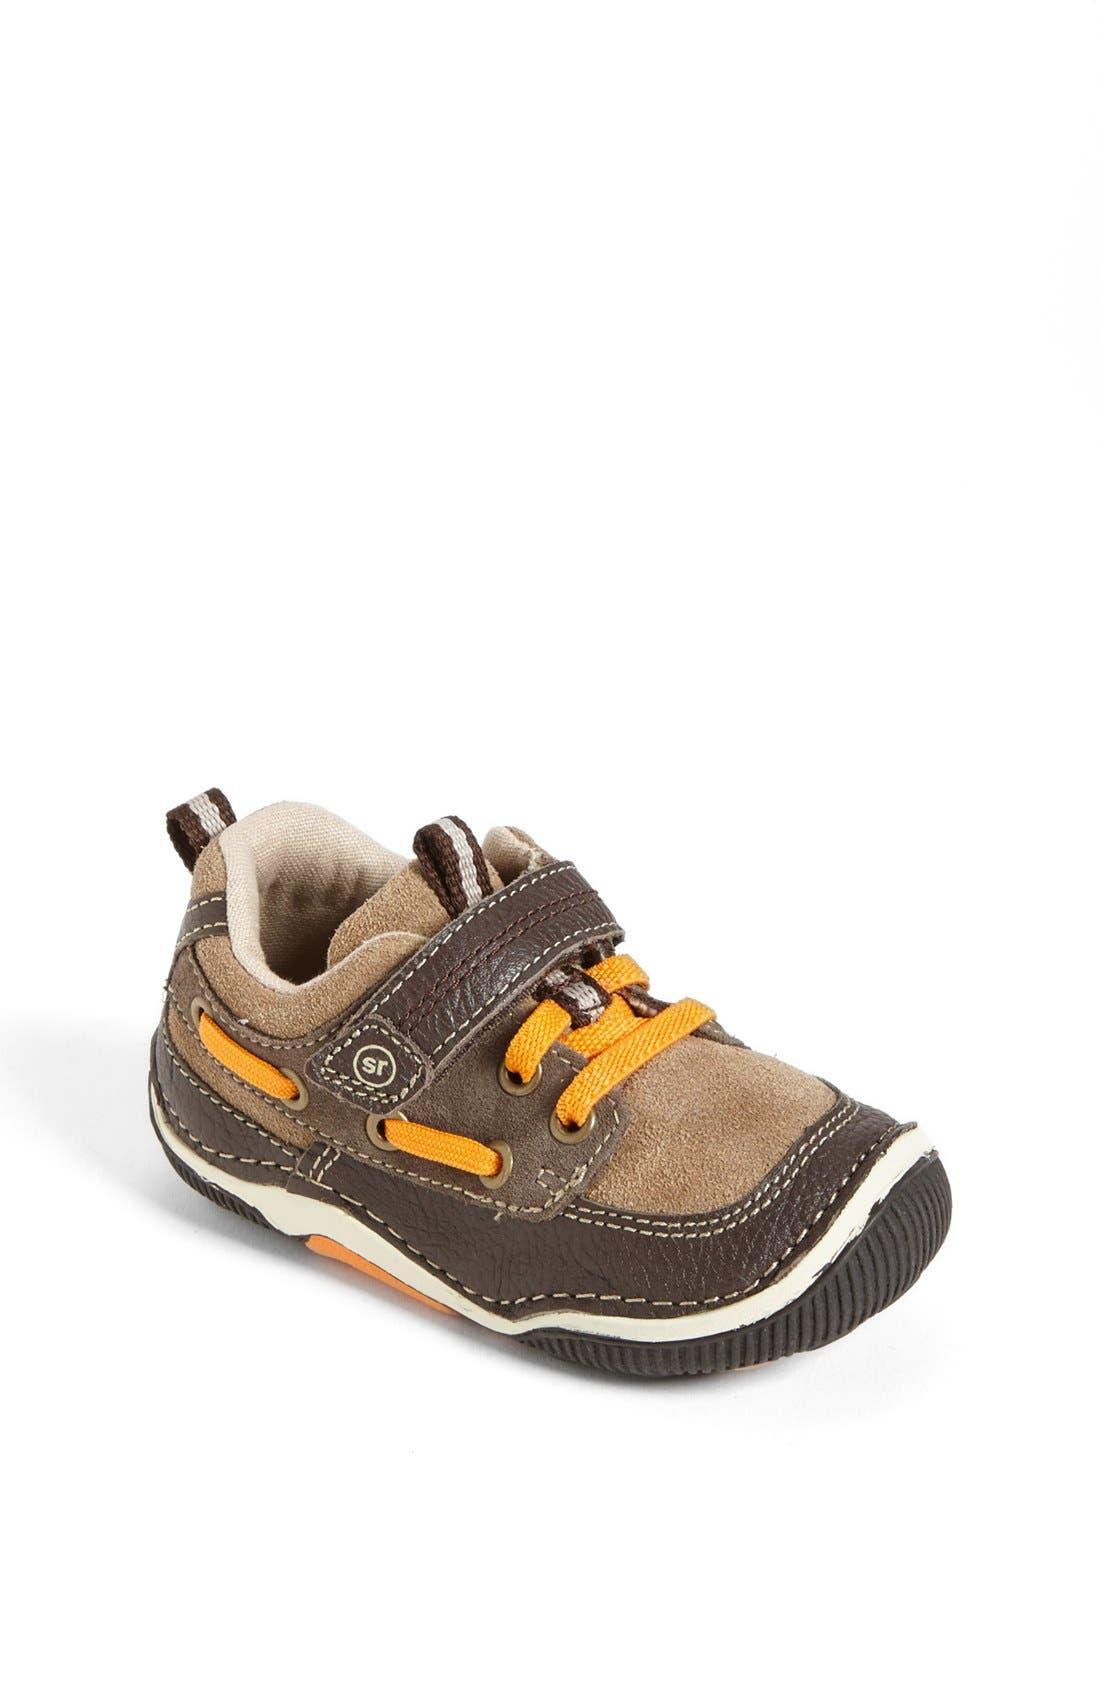 Main Image - Stride Rite 'Mosby' Sneaker (Baby, Walker & Toddler)